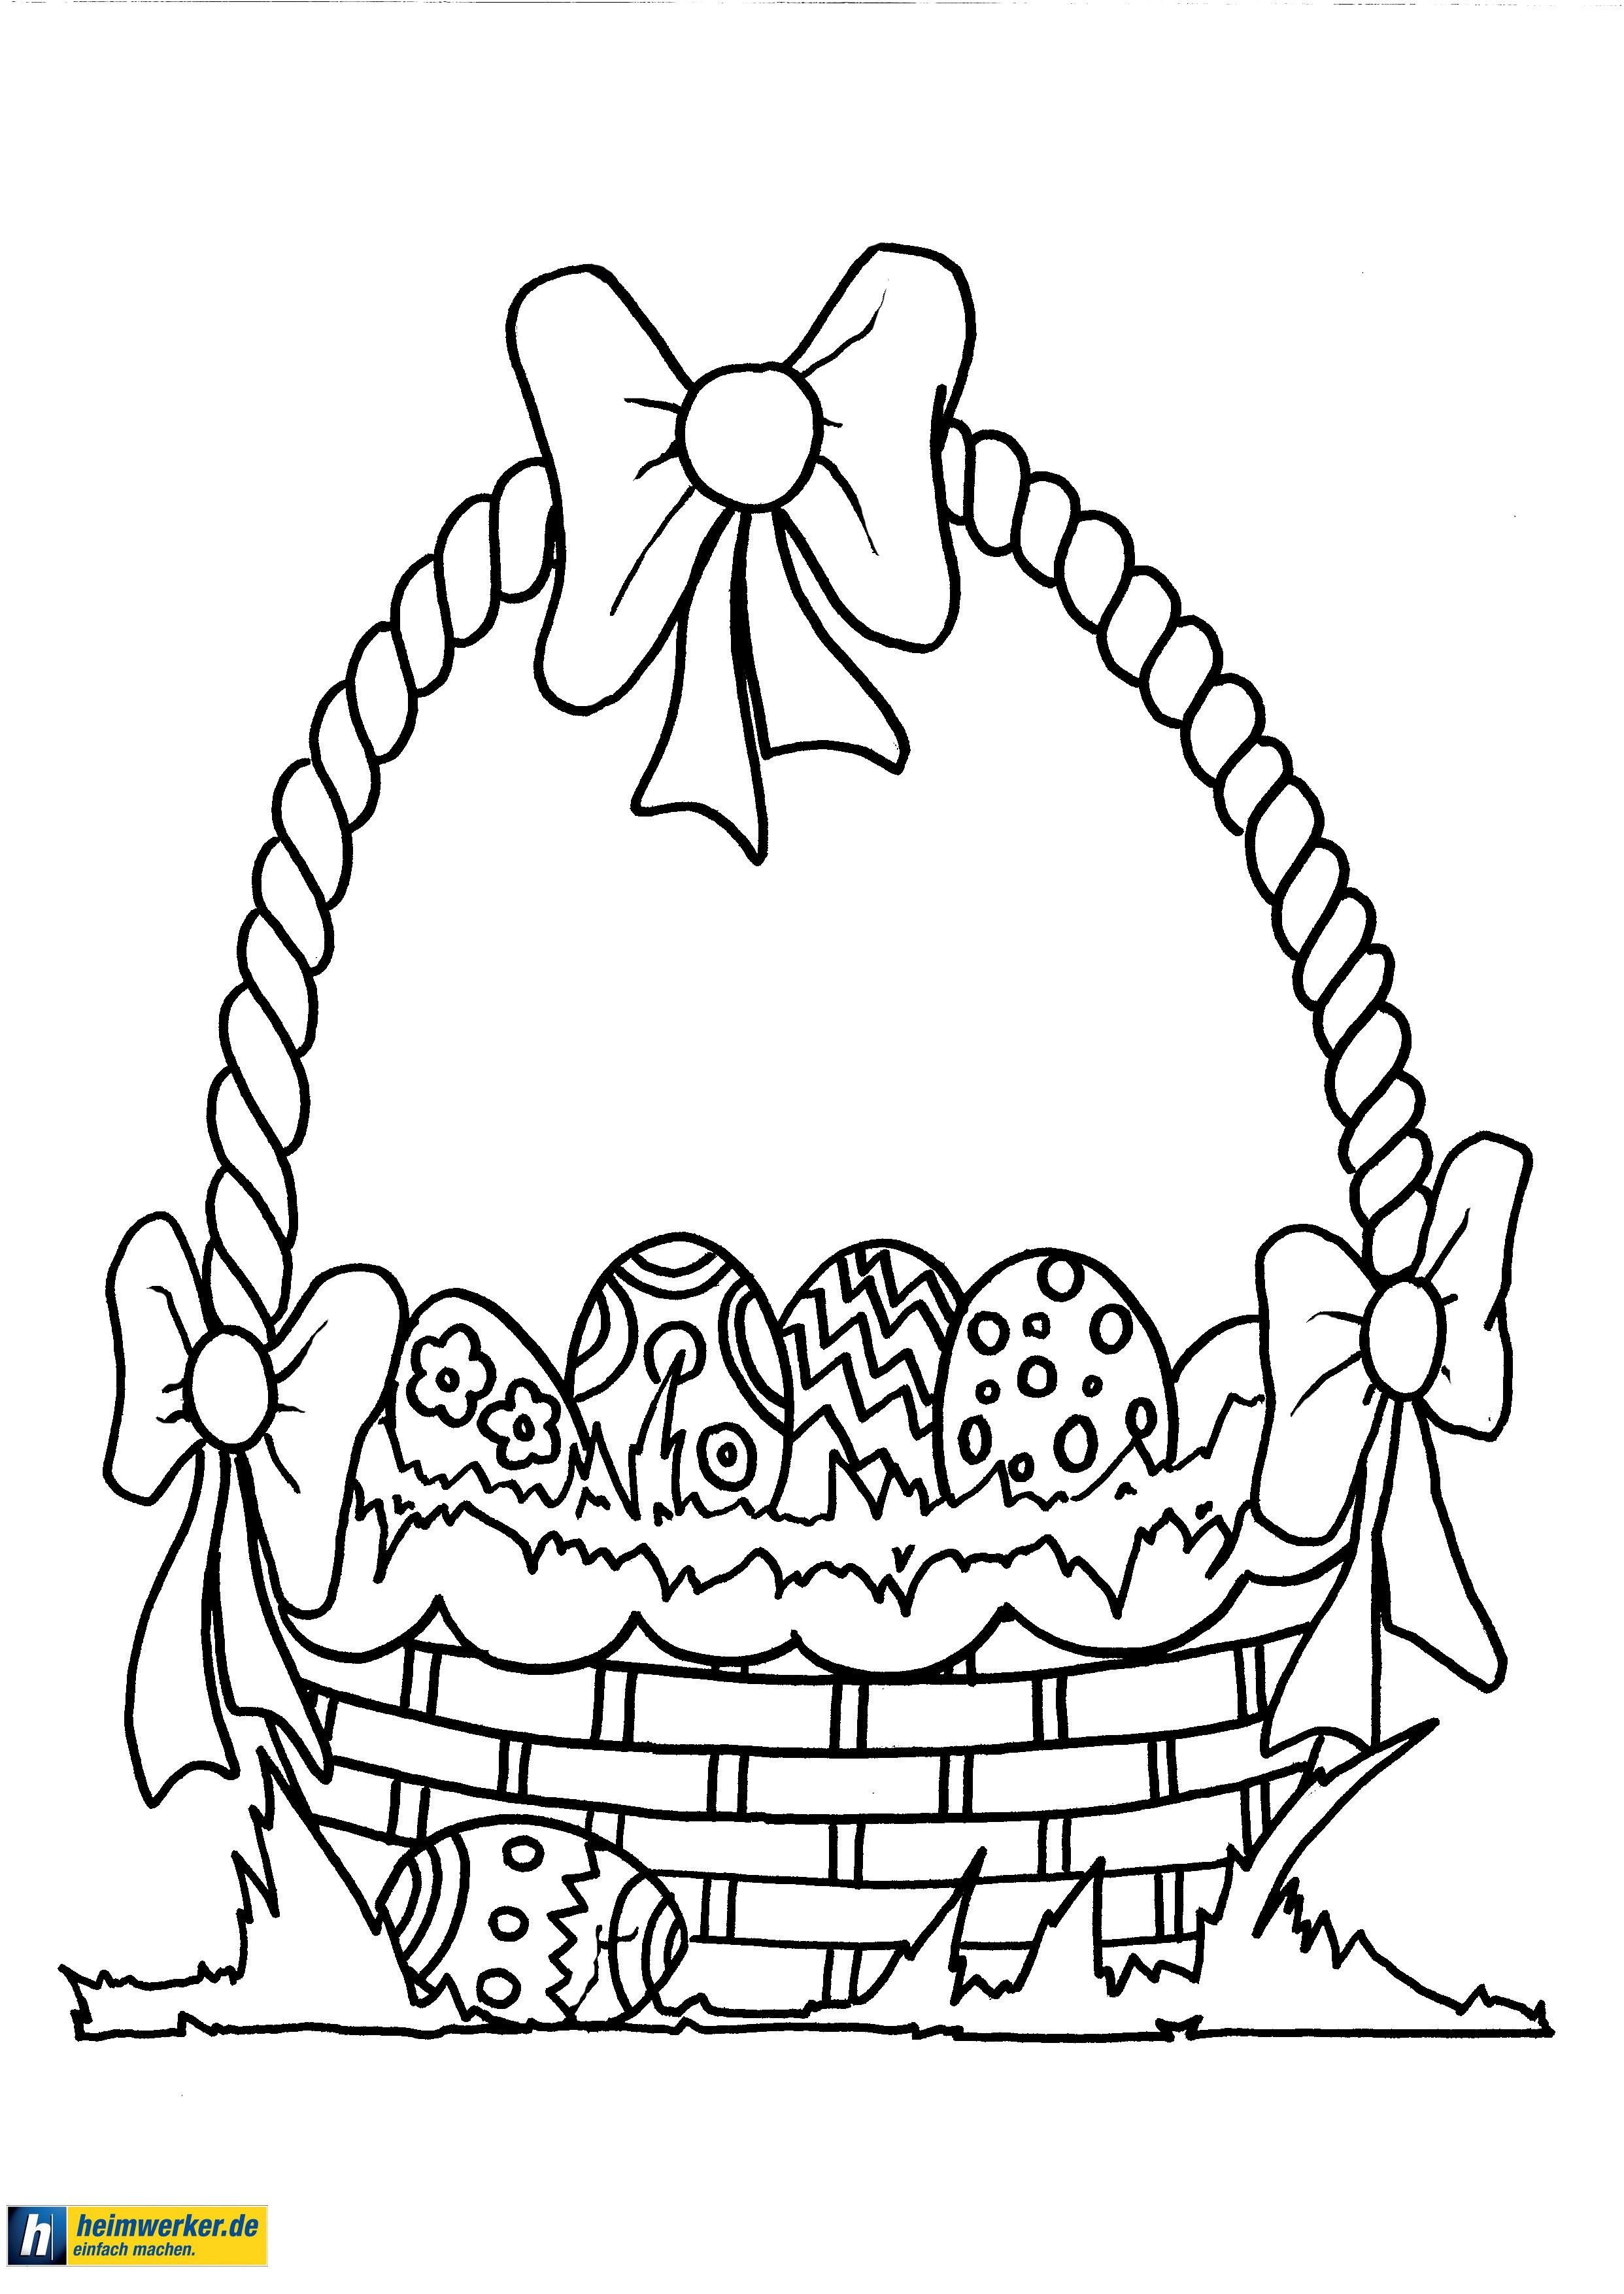 Ausmalbilder Ostern Hase Neu 32 Osterkorb Ausmalbilder Scoredatscore Schön Hase Ausmalbilder Zum Fotografieren